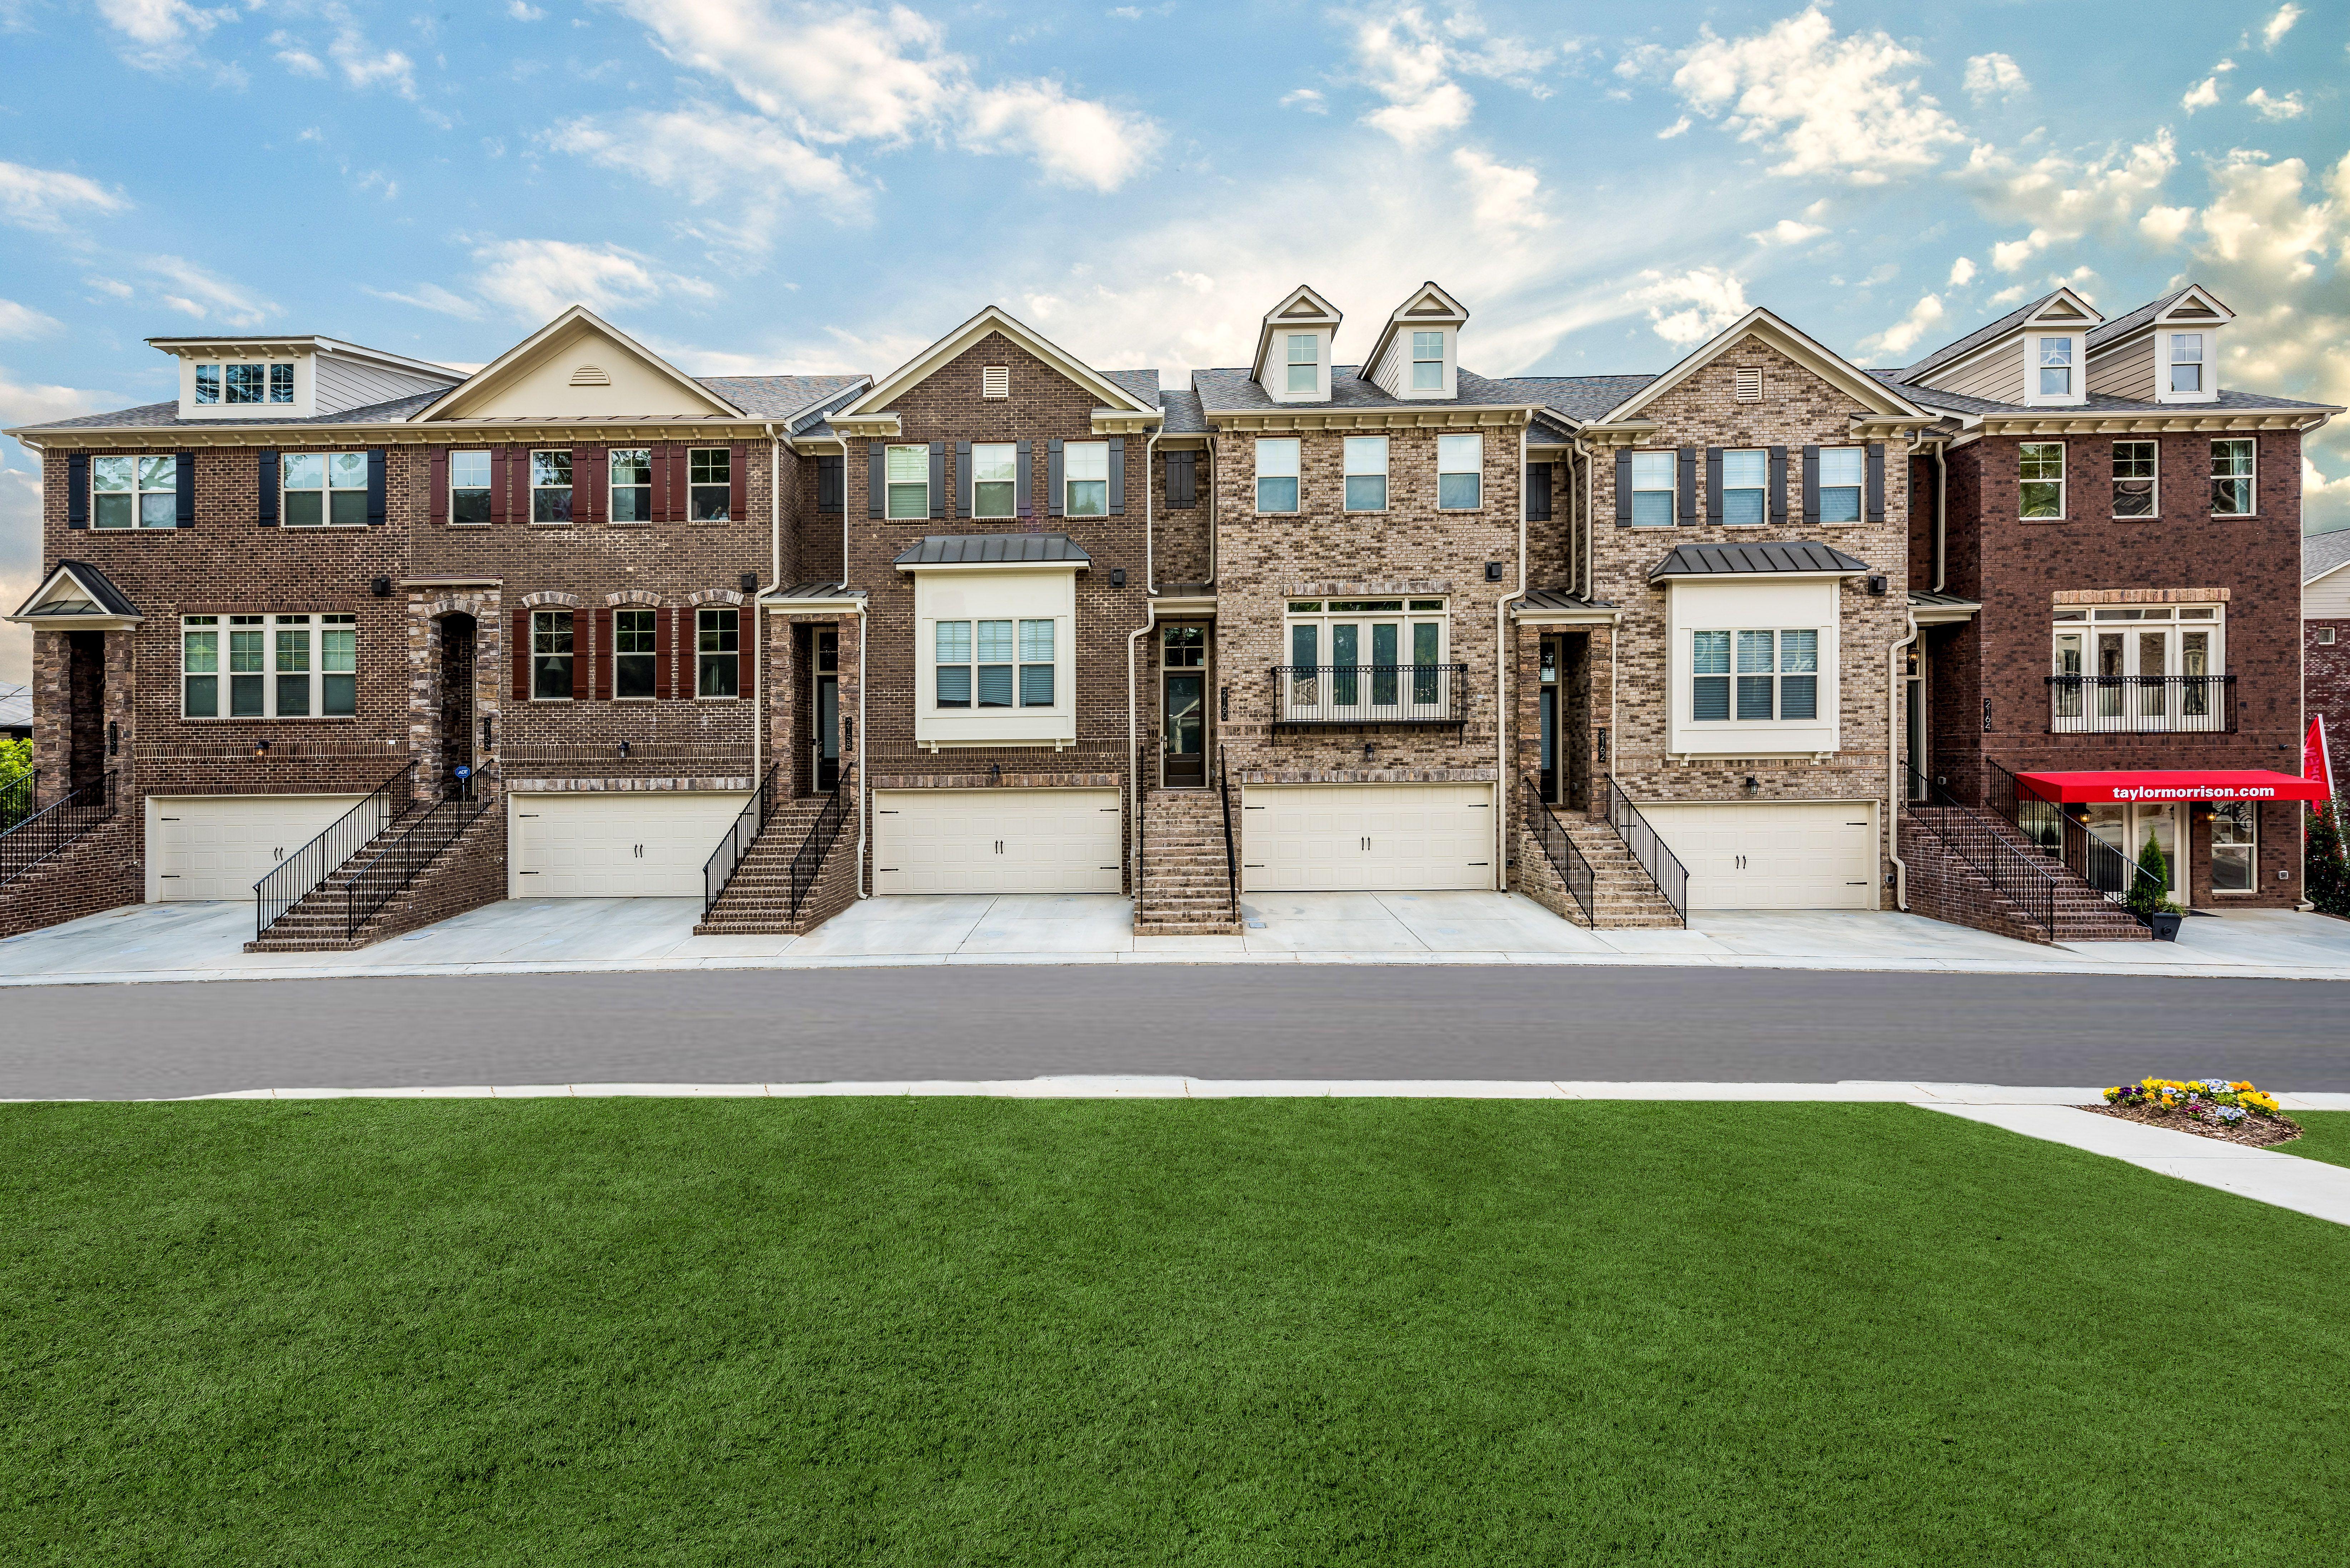 New Home Communities in 30319, Atlanta